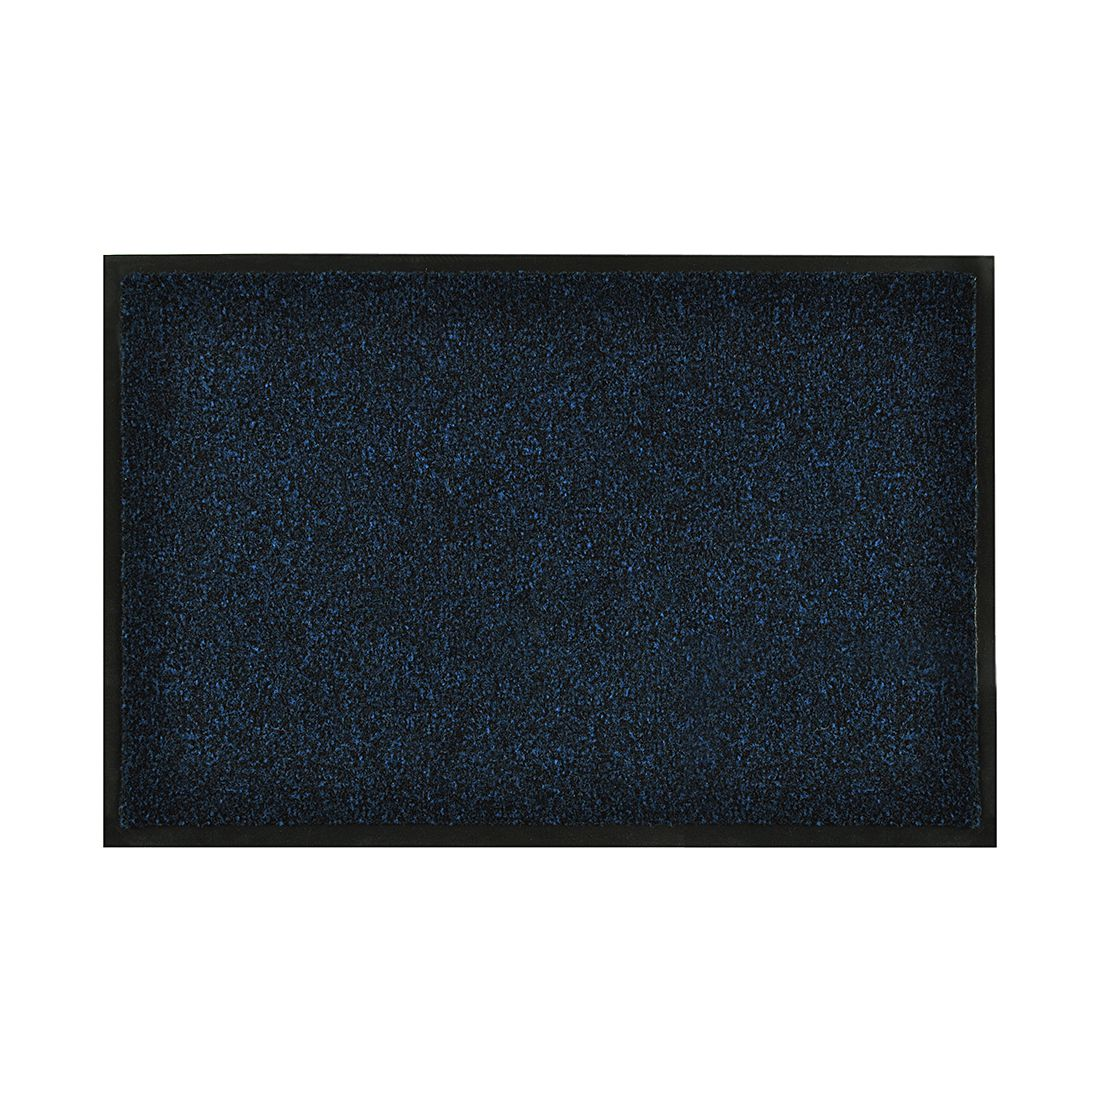 Image of Zerbino Green e Clean - Blu & 40 x 60 cm, Hanse Home Collection